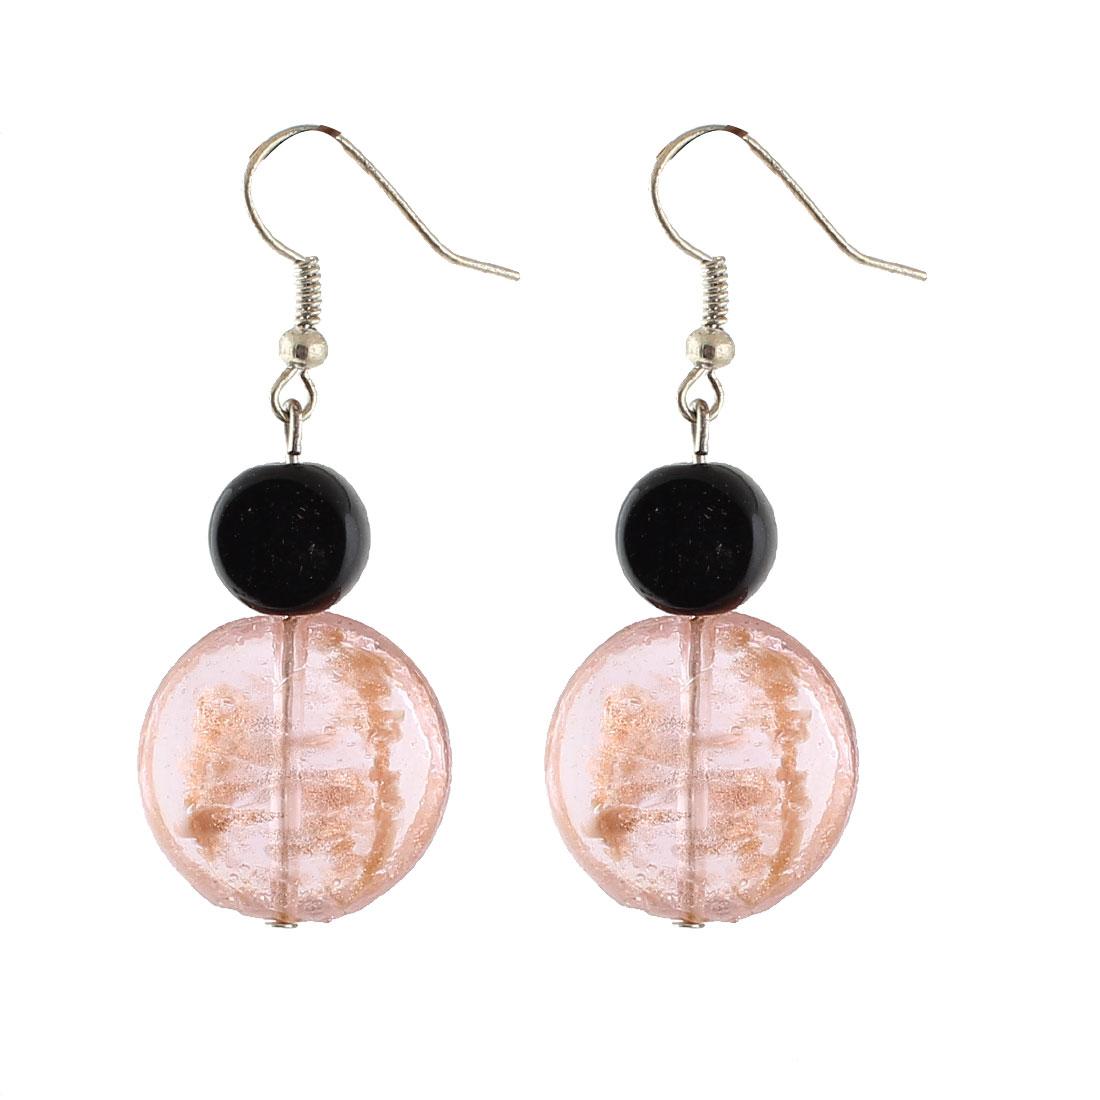 Women Plastic Oval Bead Pendant Fish Hook Earrings Coral Pink Pair